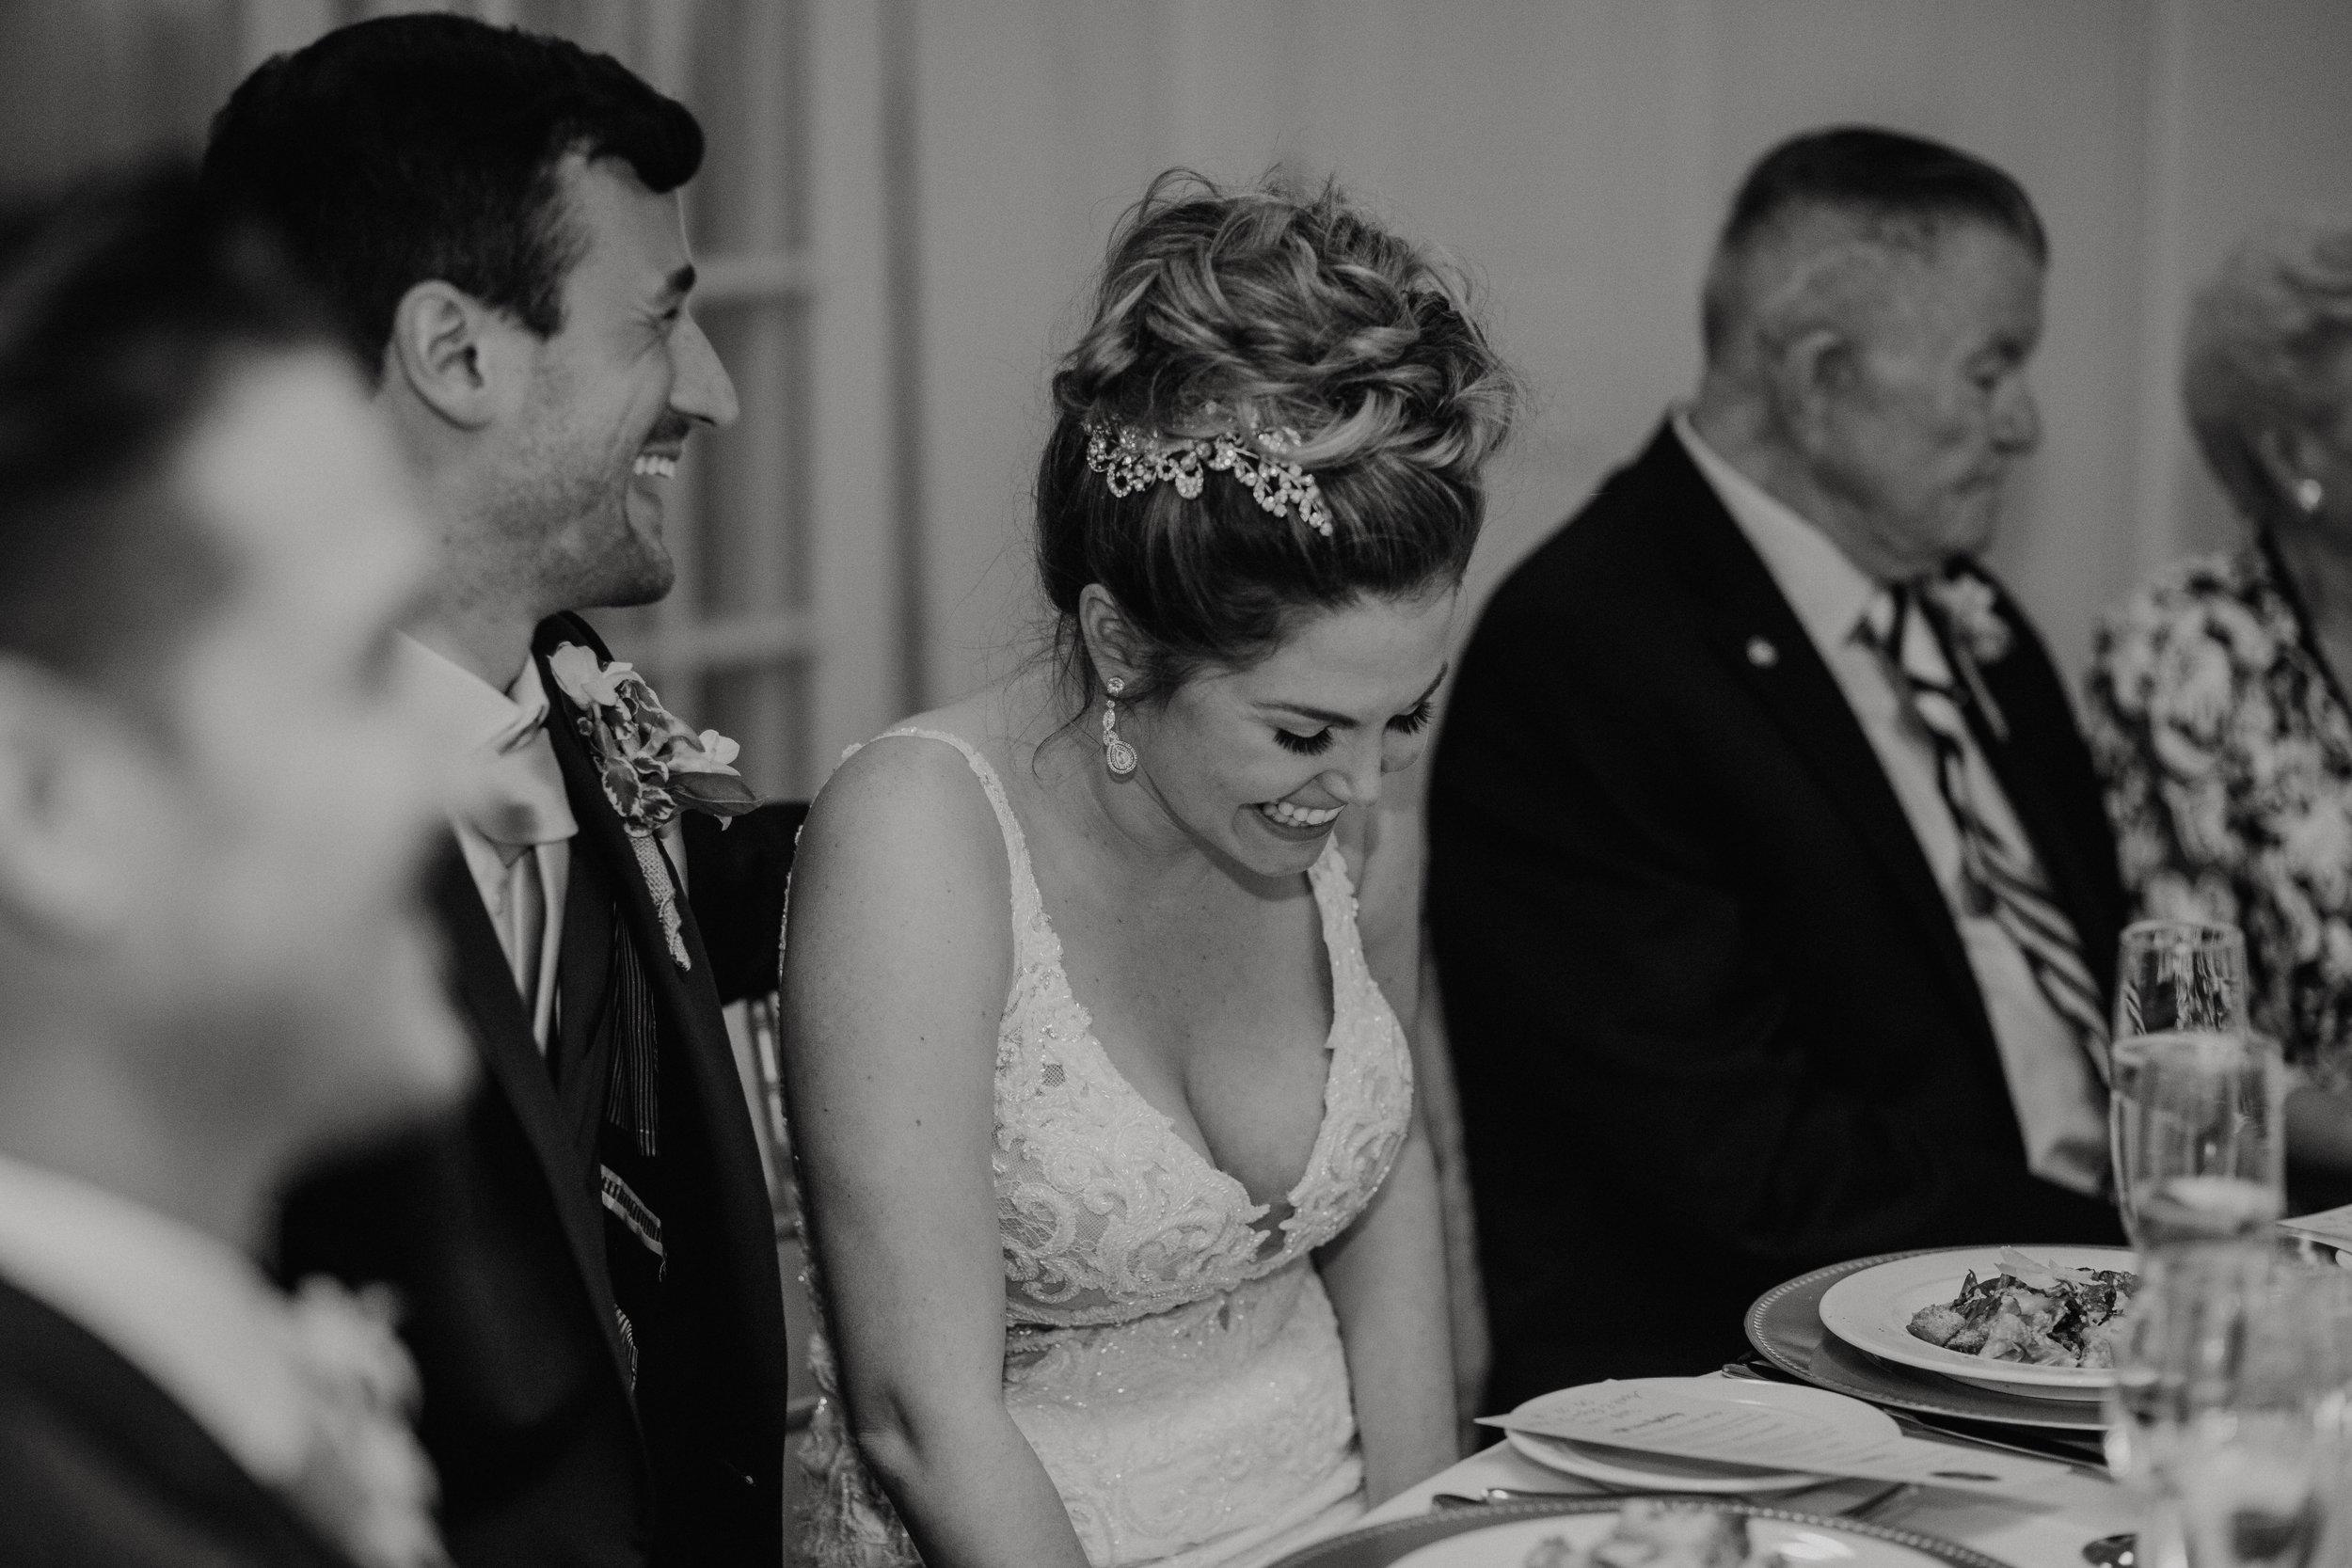 old_daley_on_crooked_lake_wedding_-99.jpg